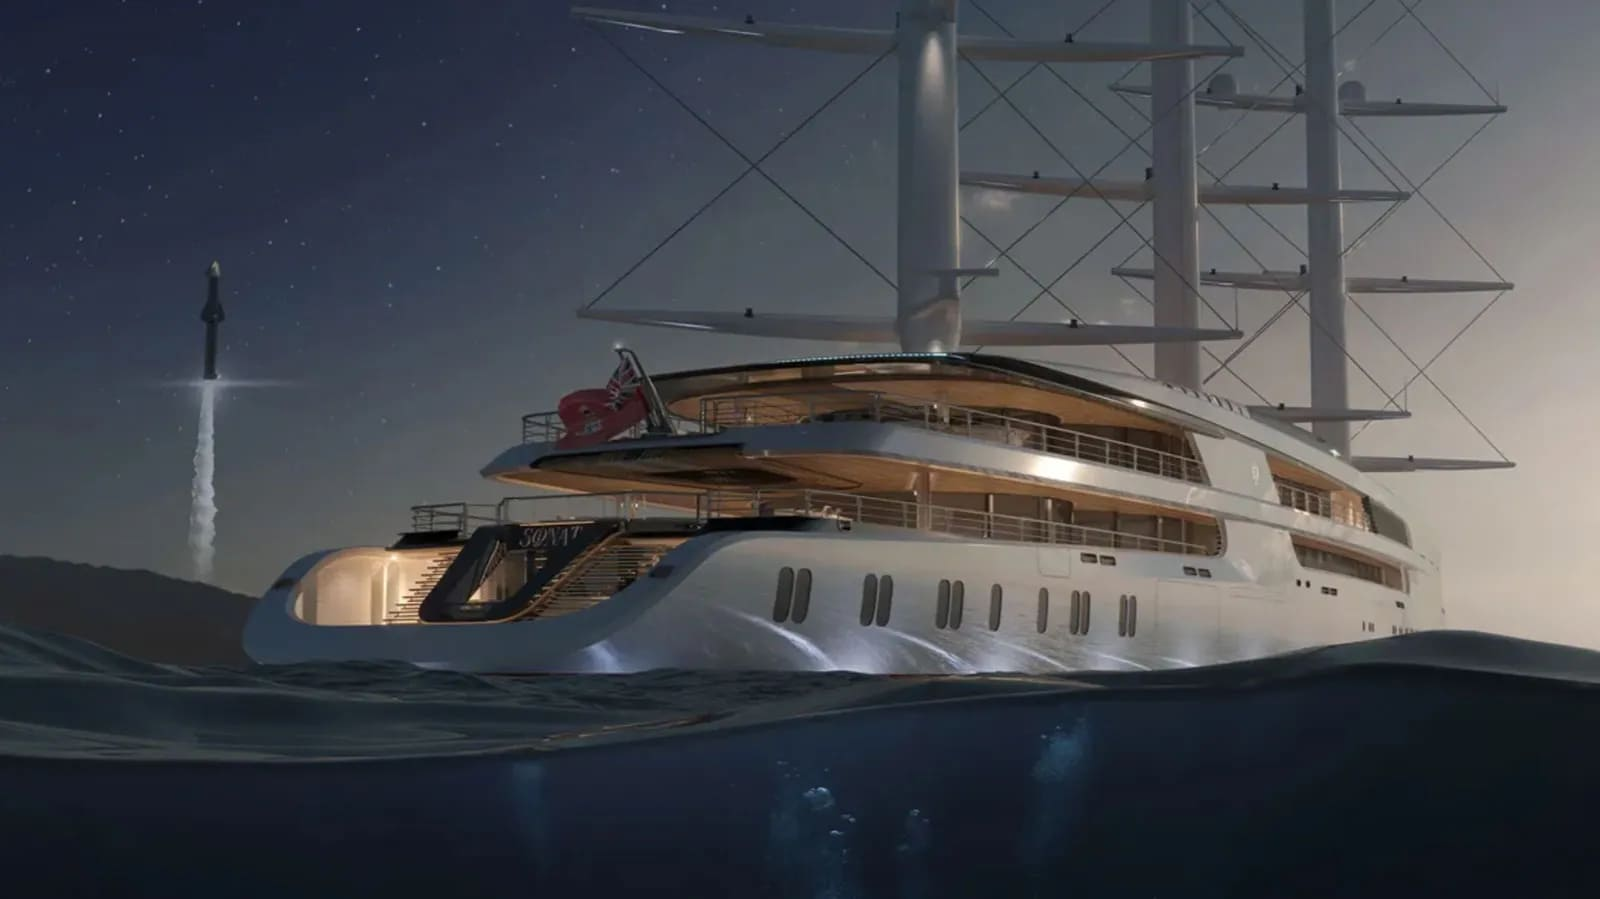 Project Sonata boat shopping 4